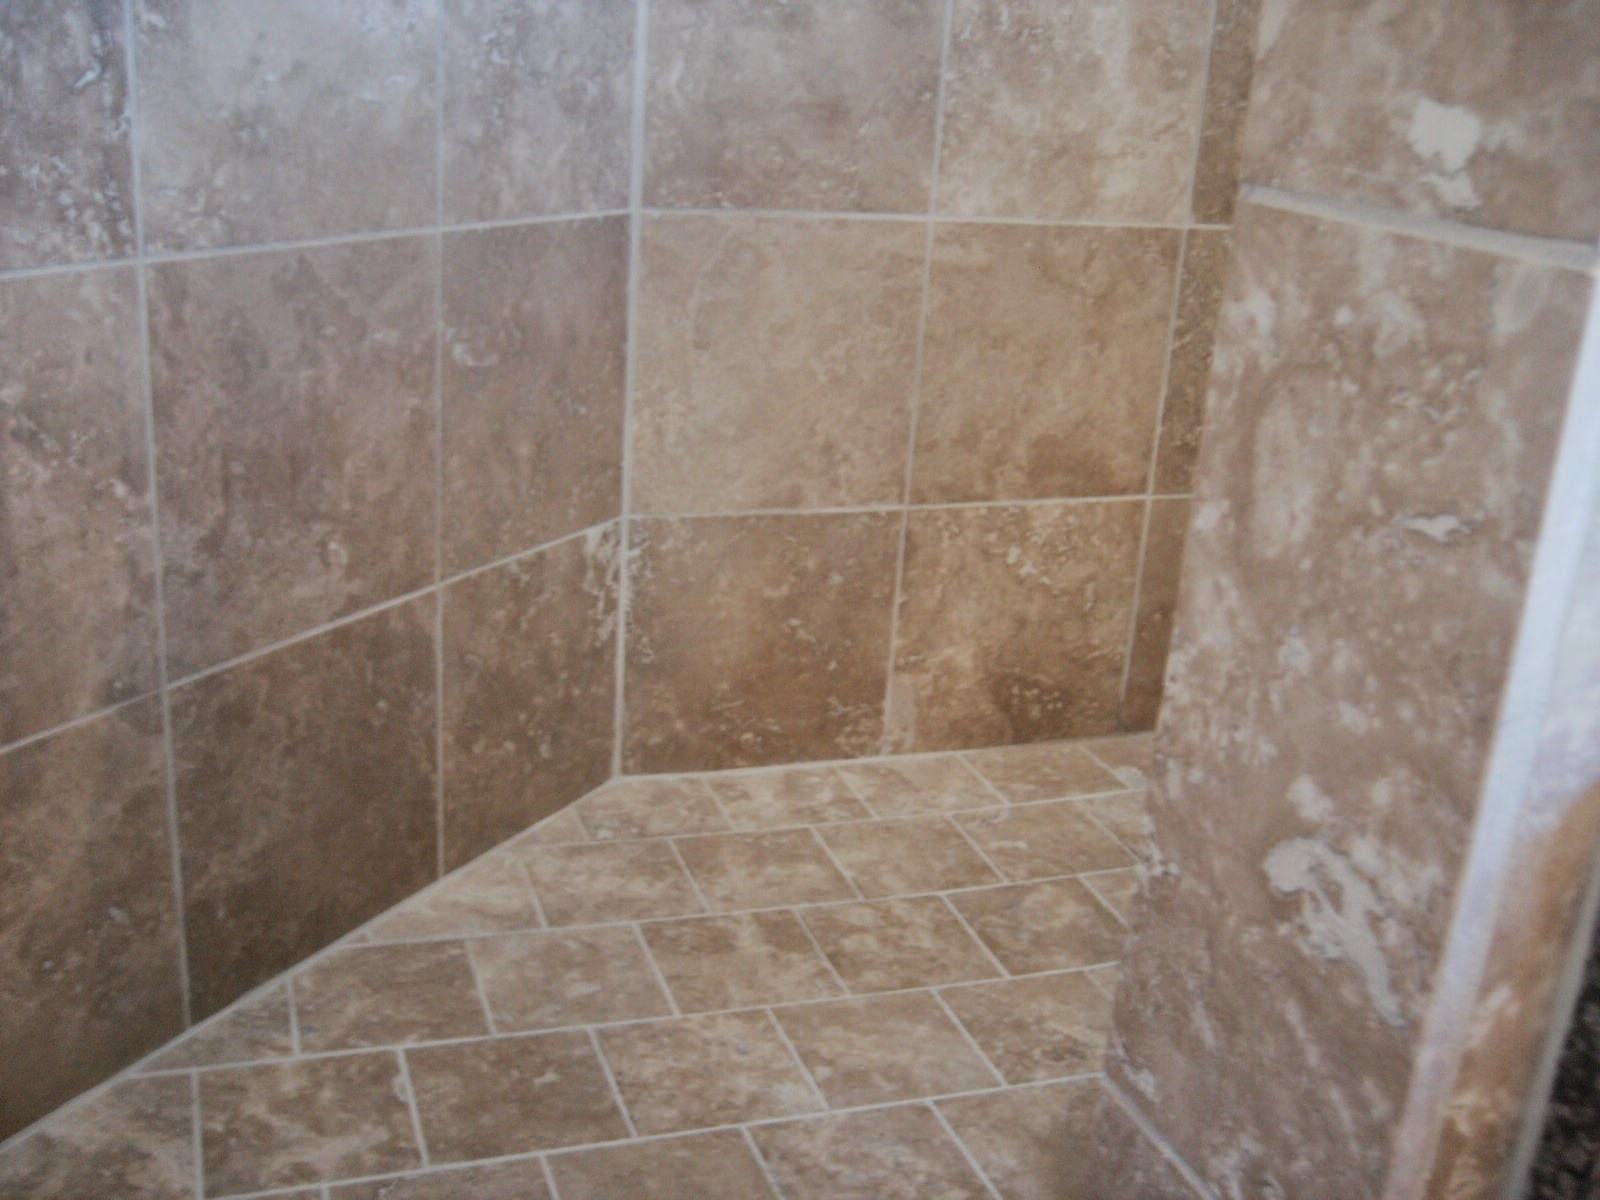 Grouting Travertine Tile | Tile Design Ideas